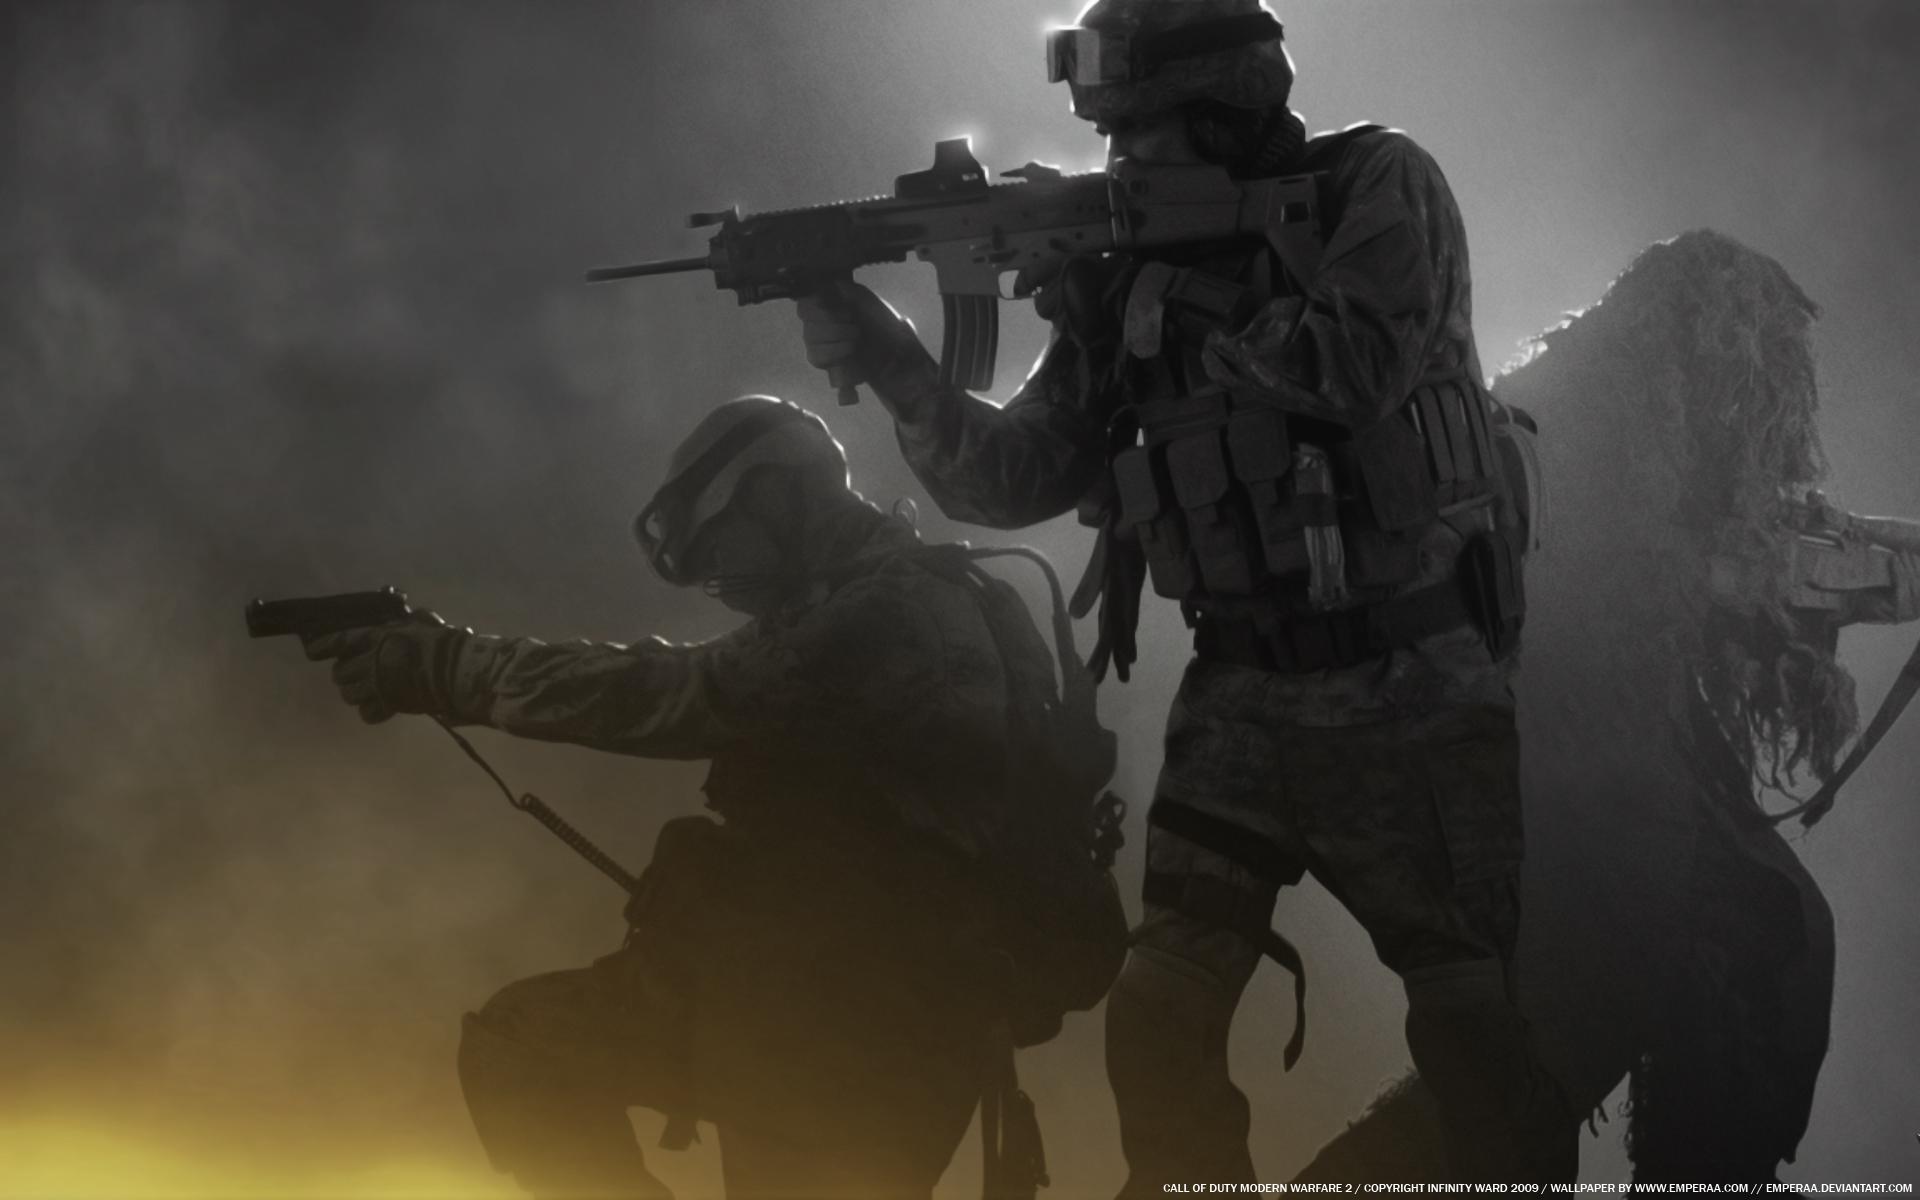 [49+] Special Forces Wallpaper Desktop Free on WallpaperSafari